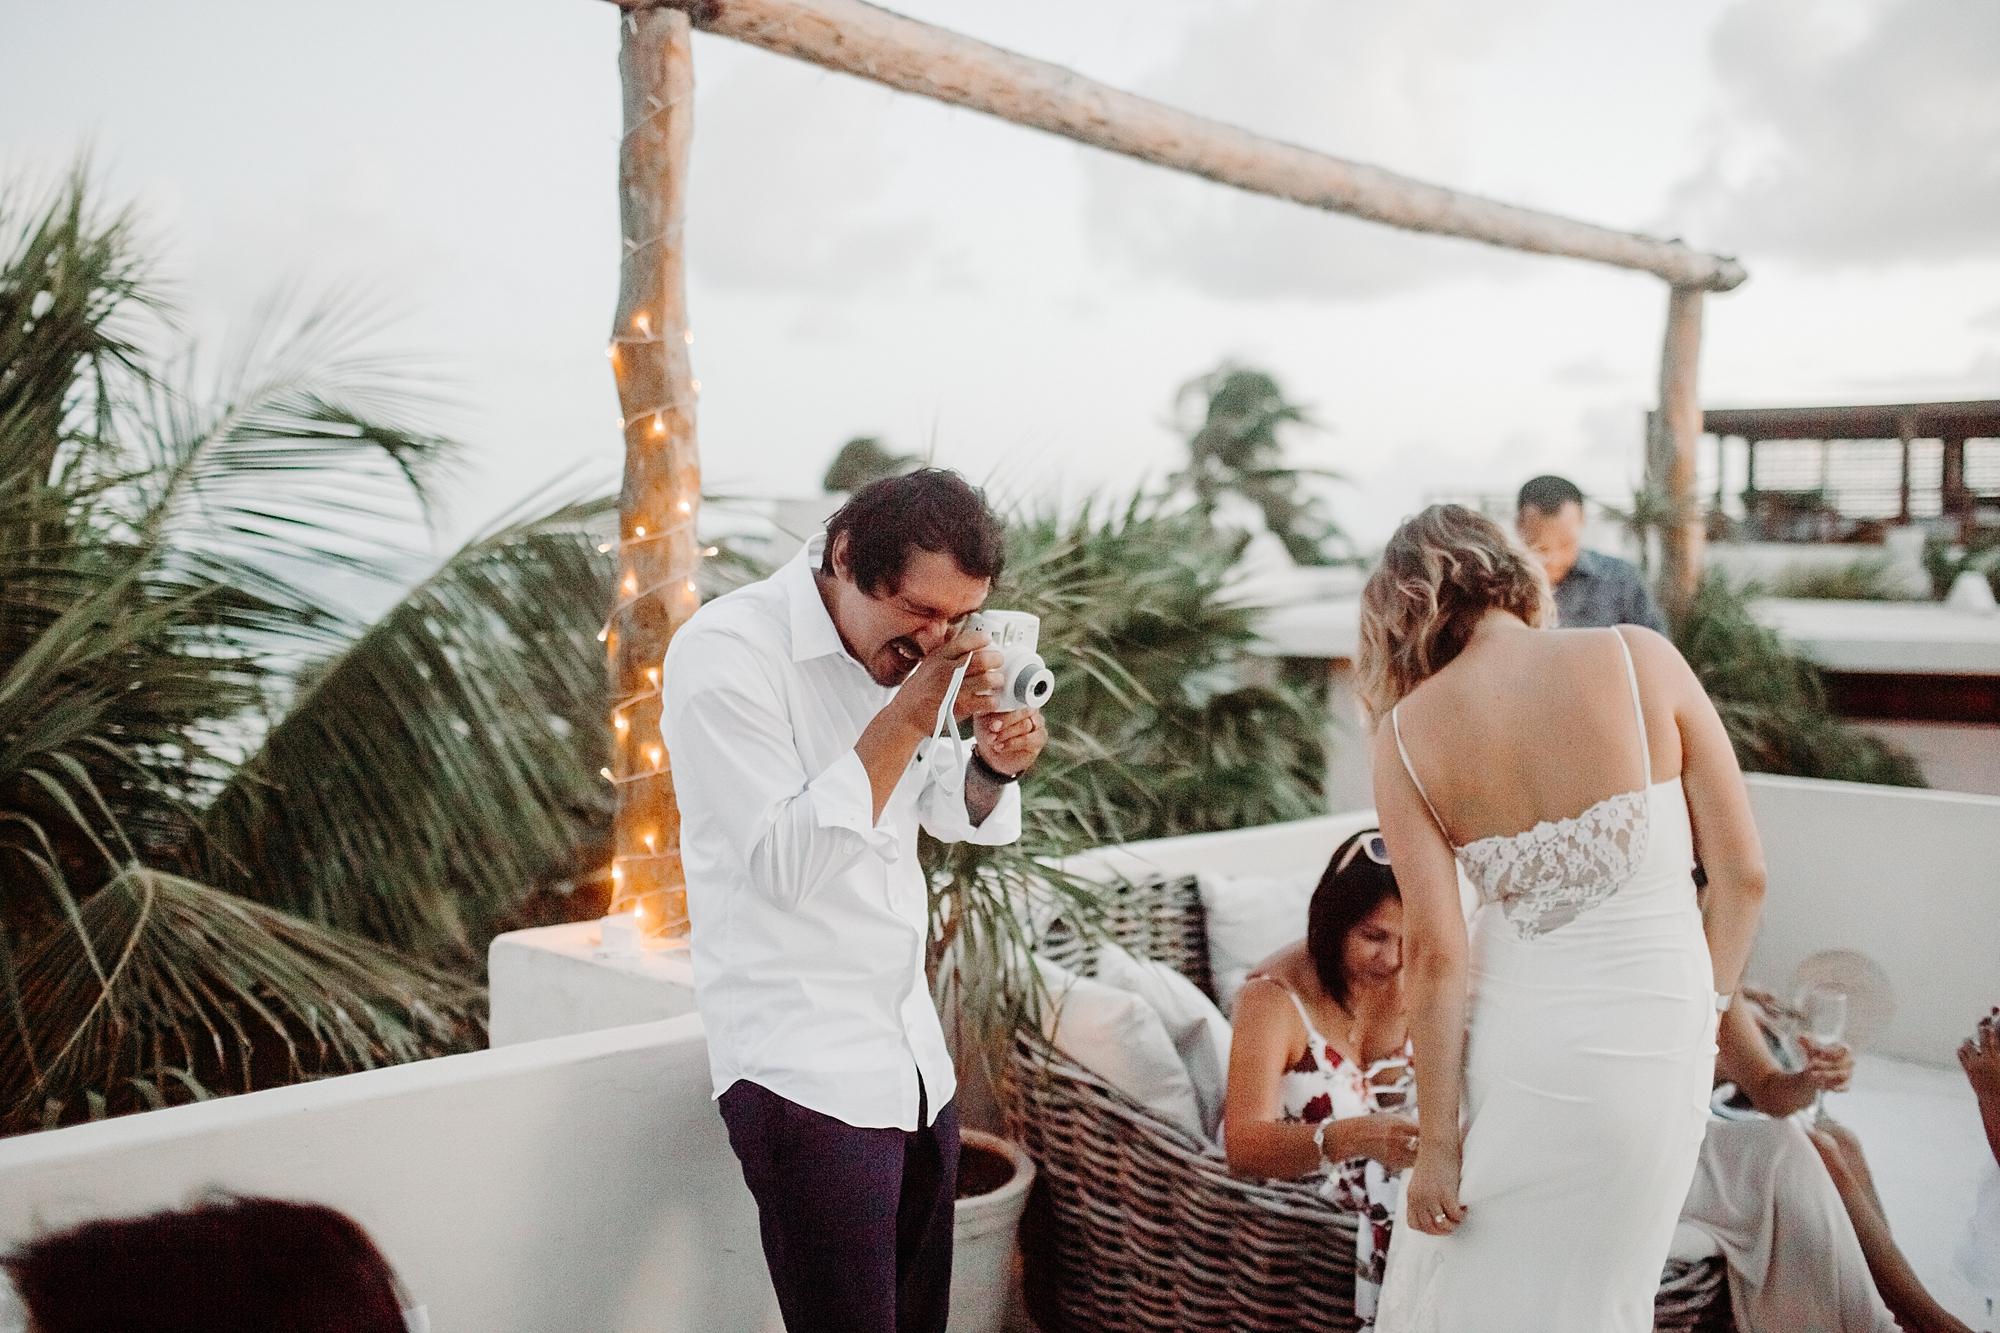 Danielle-San-Antonio-Wedding-Photographer-267_WEB.jpg